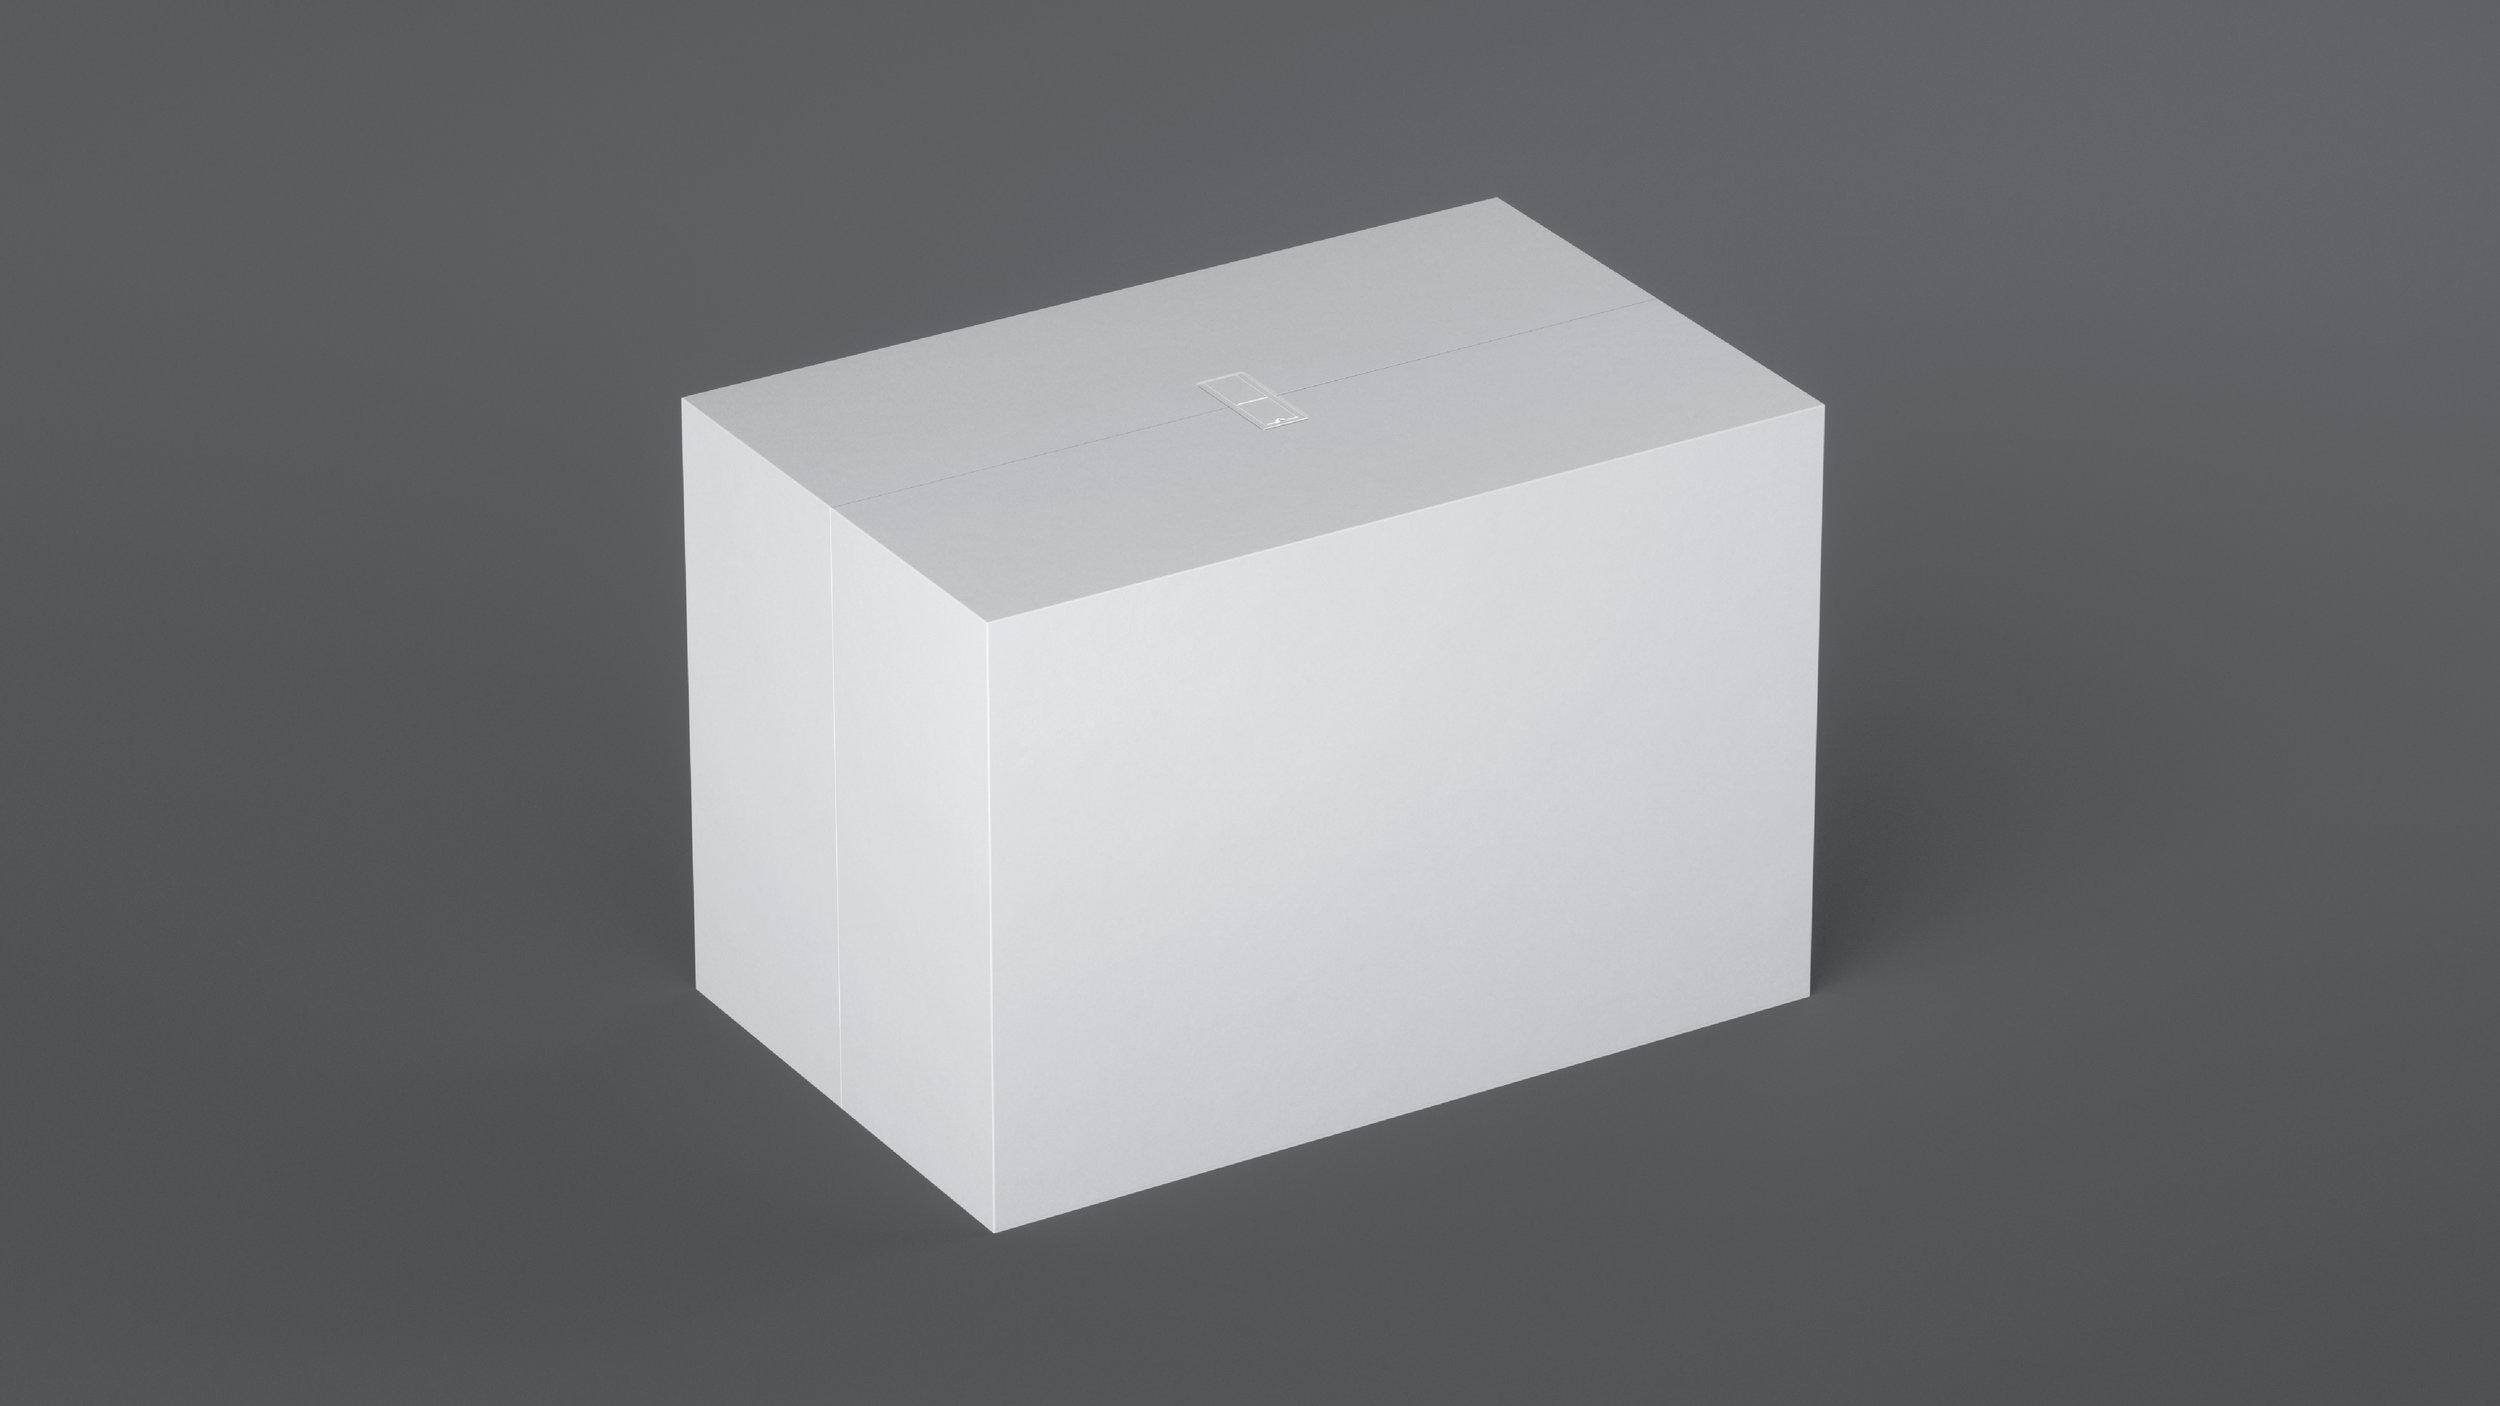 B&W_LibertySuite_PackagingStructure_R167.jpg